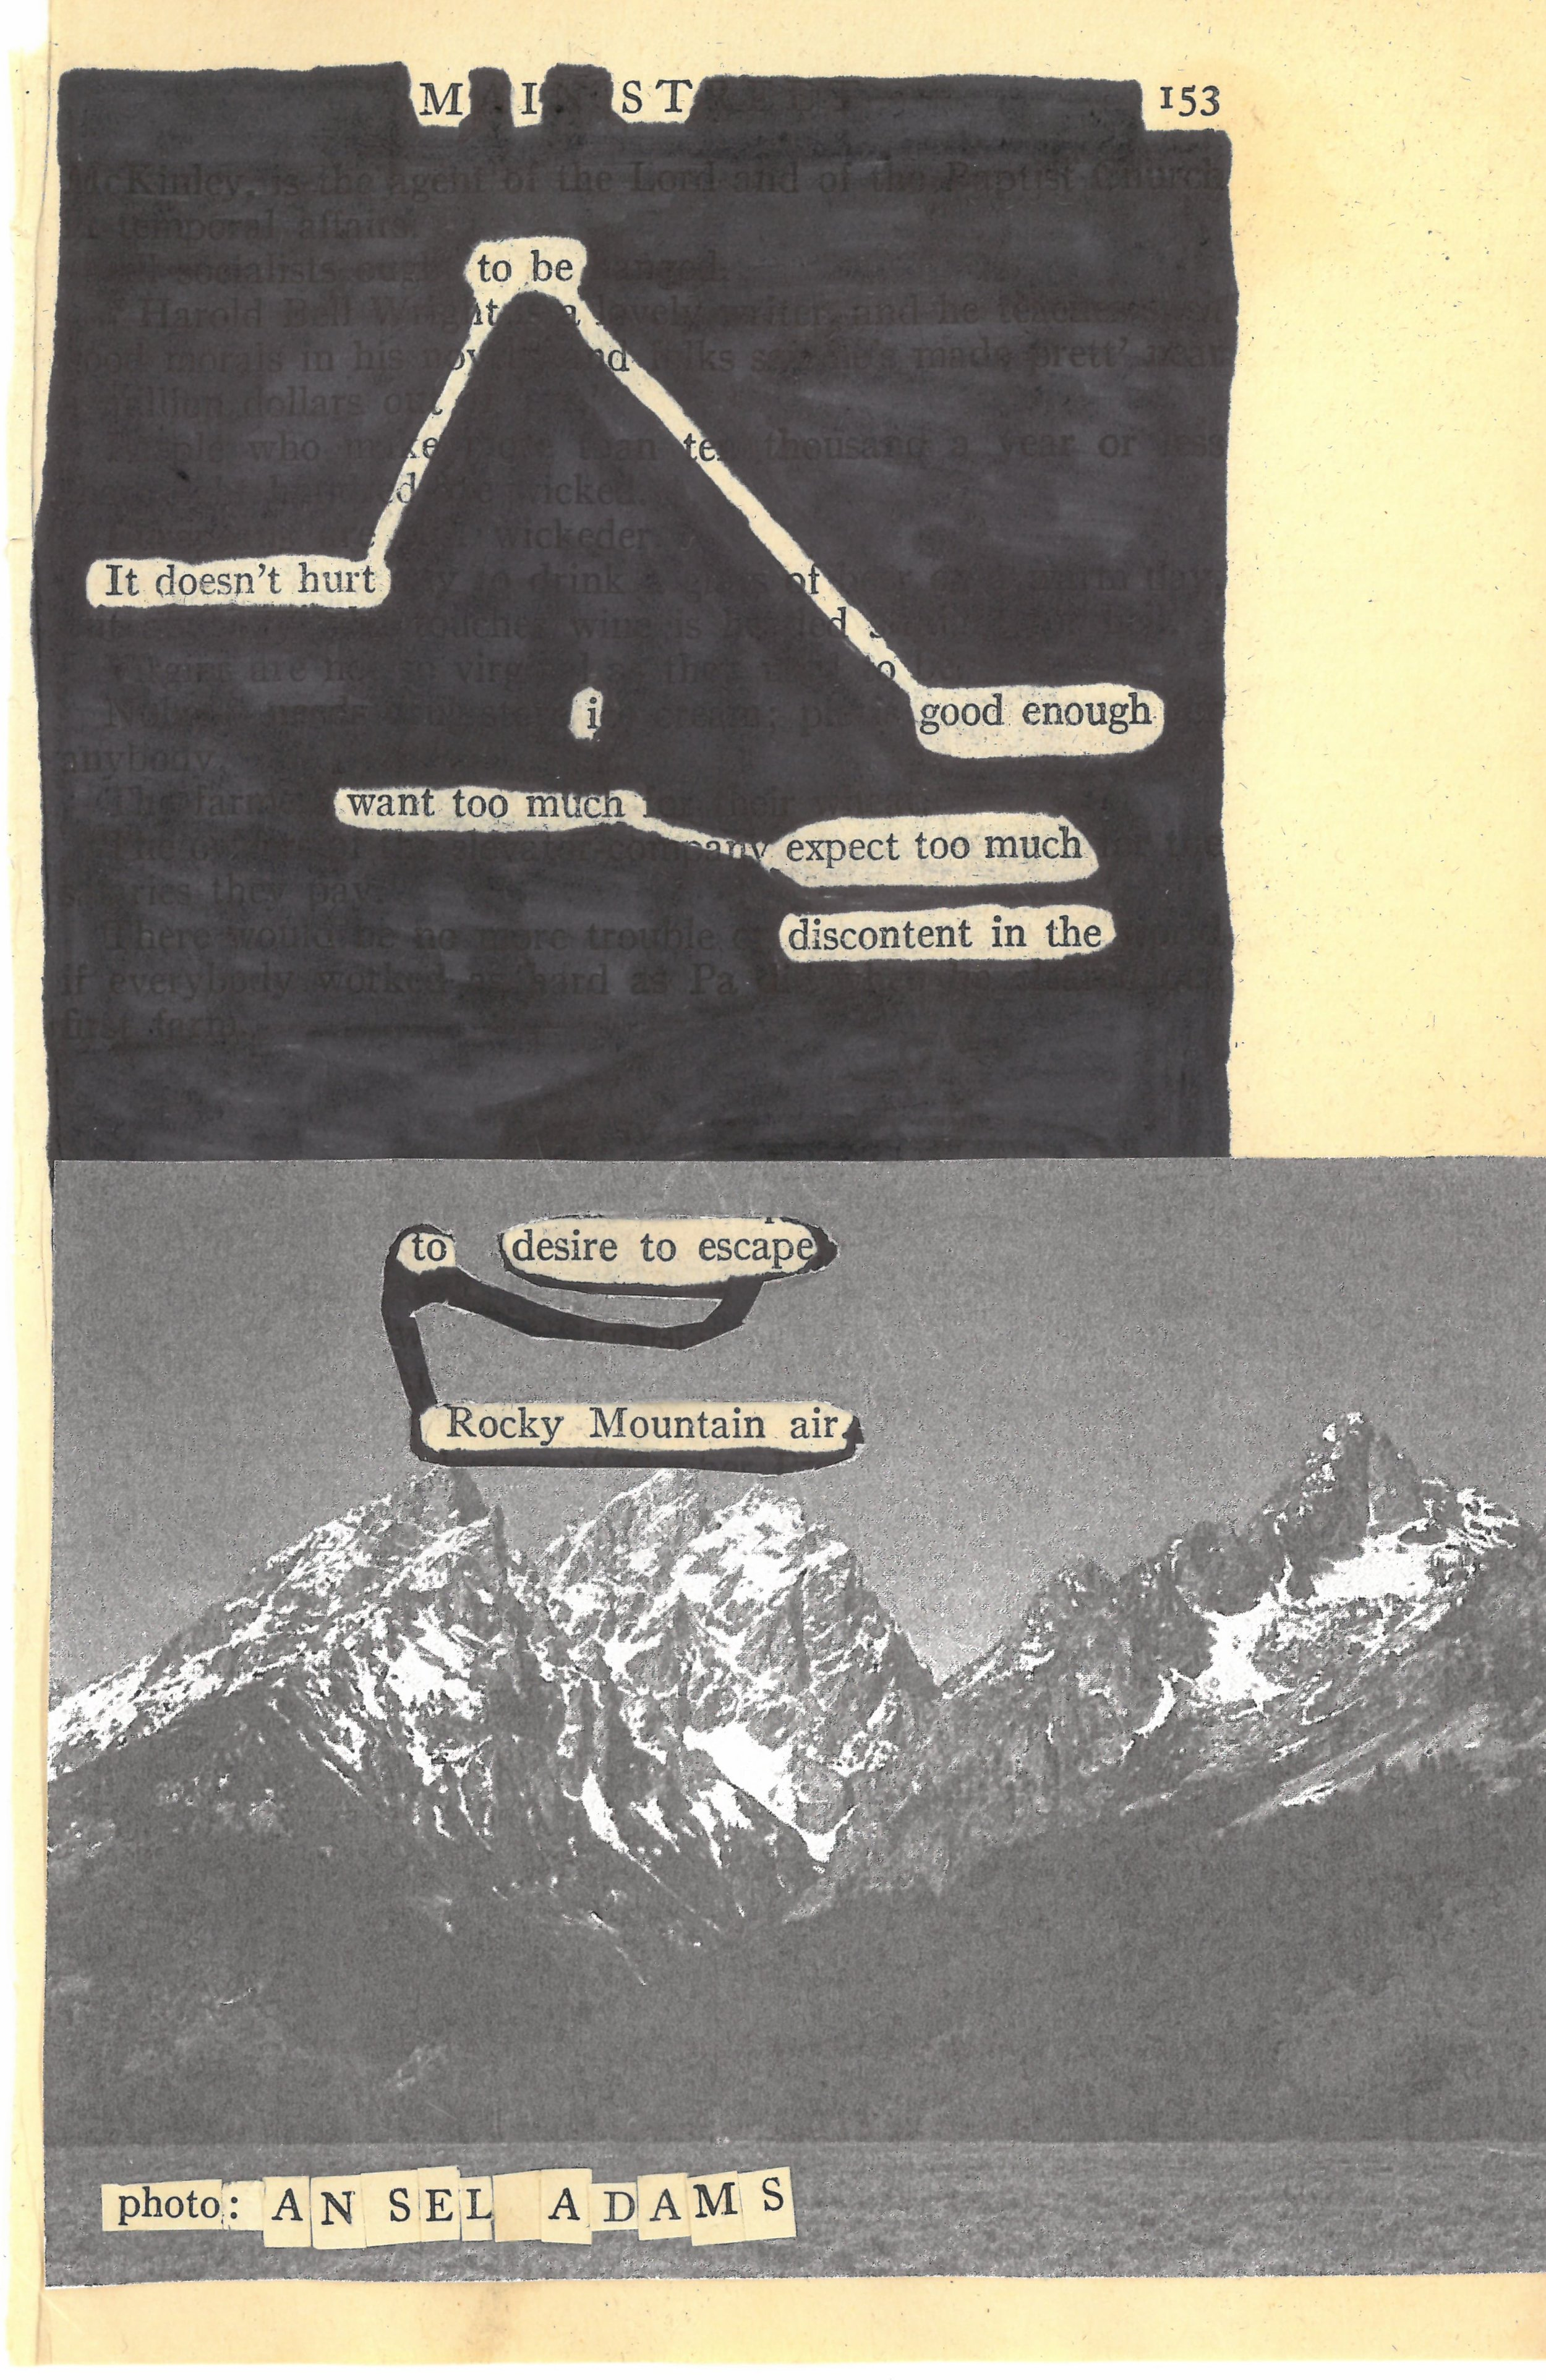 mikaela monday blackout poem2.jpg